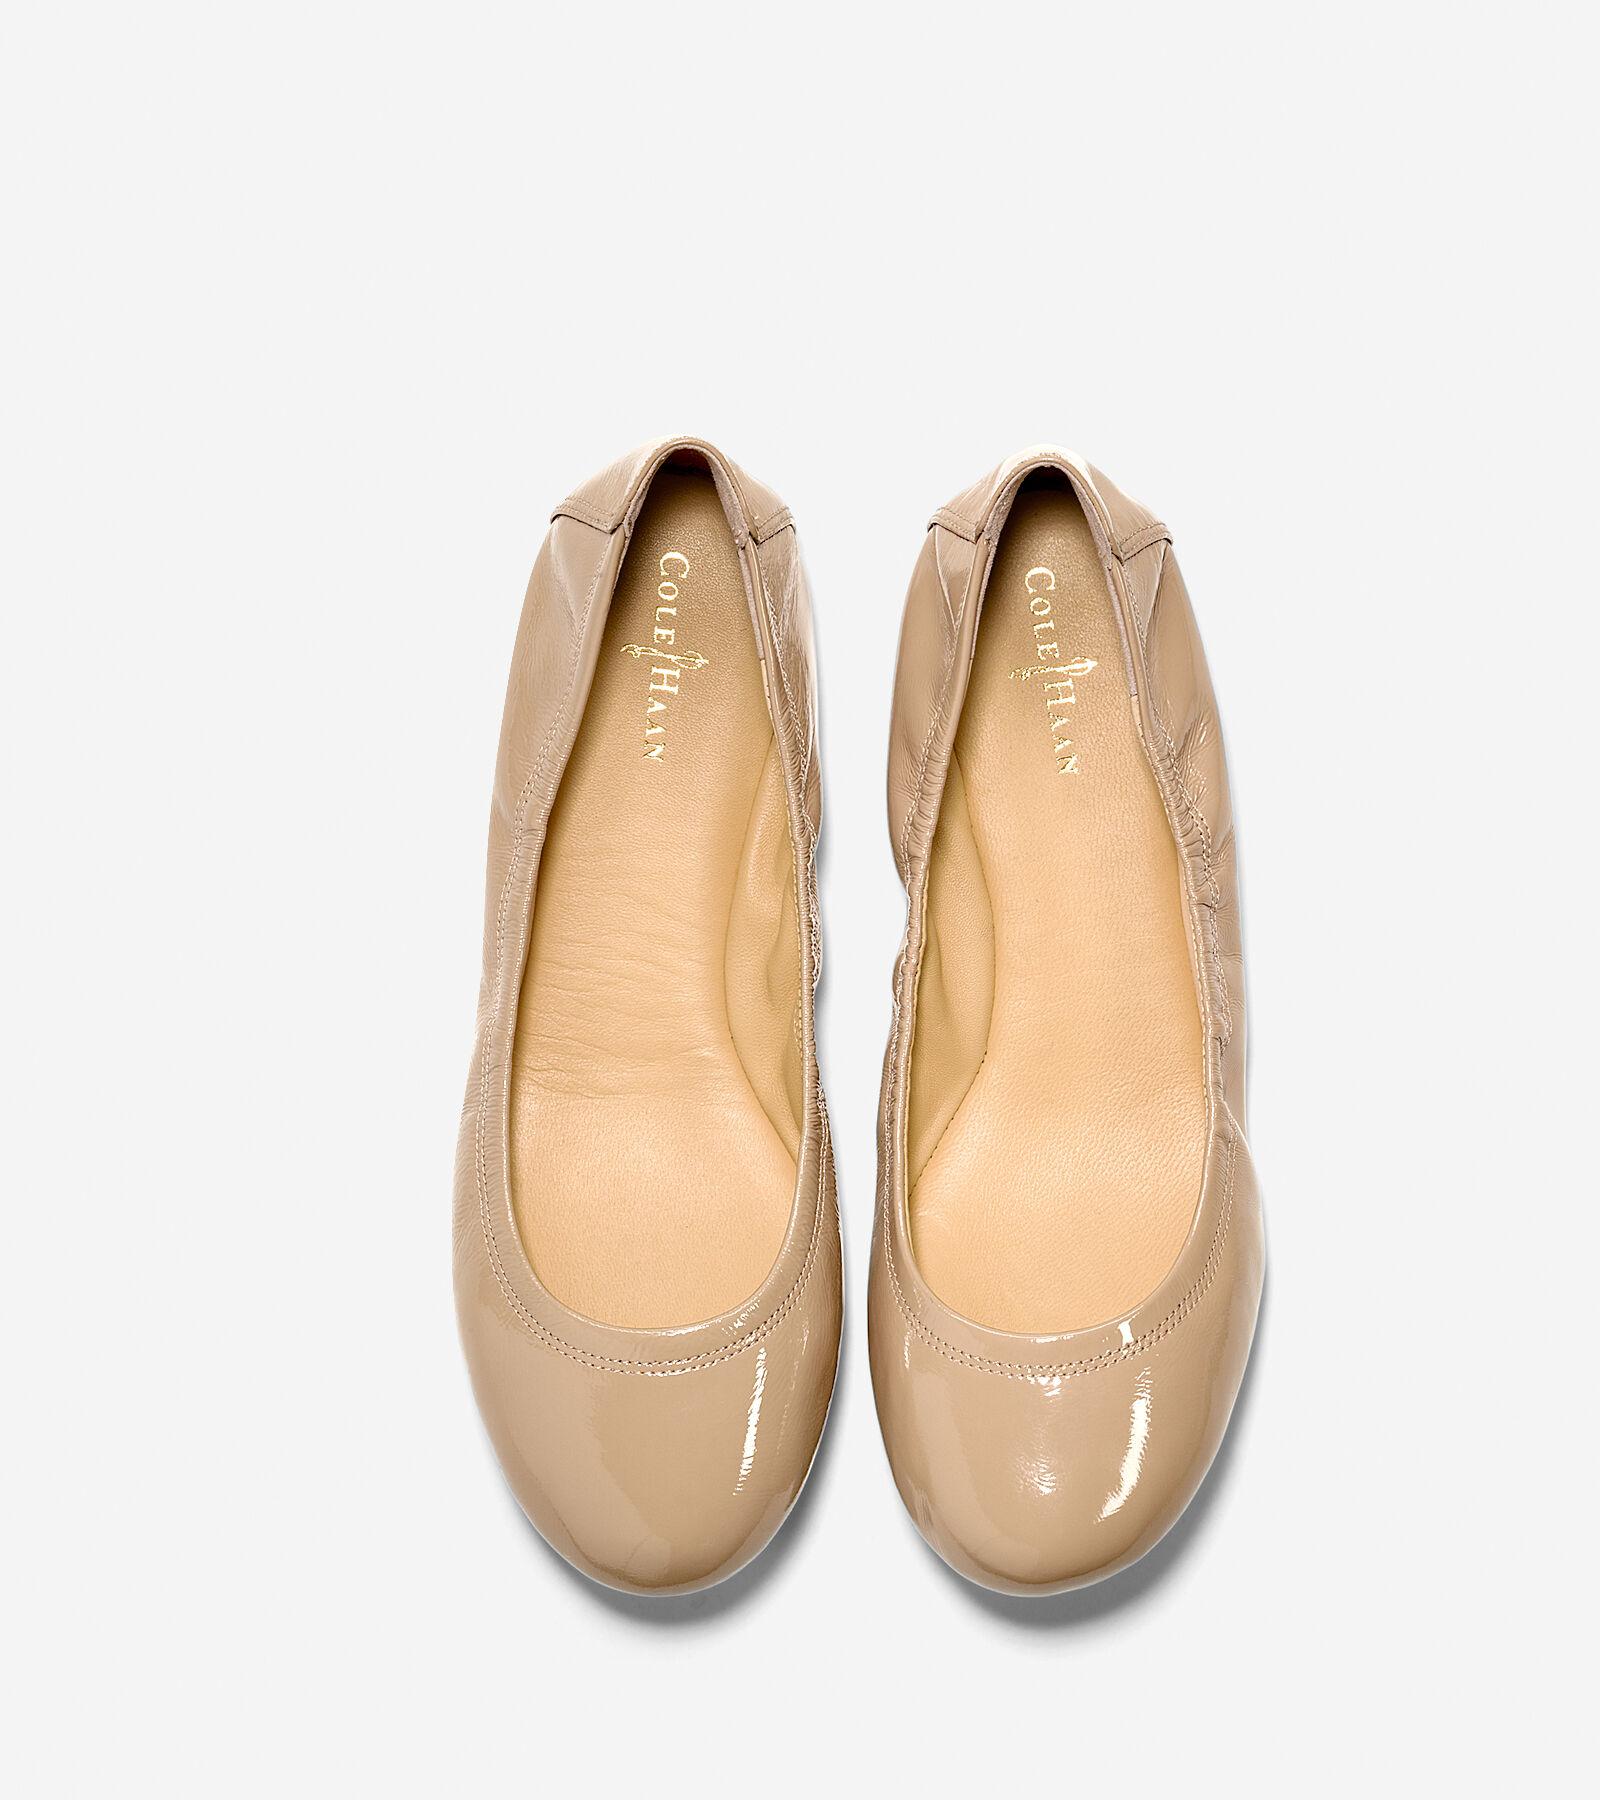 ... Manhattan Ballet Flat; Manhattan Ballet Flat; Manhattan Ballet Flat. # colehaan